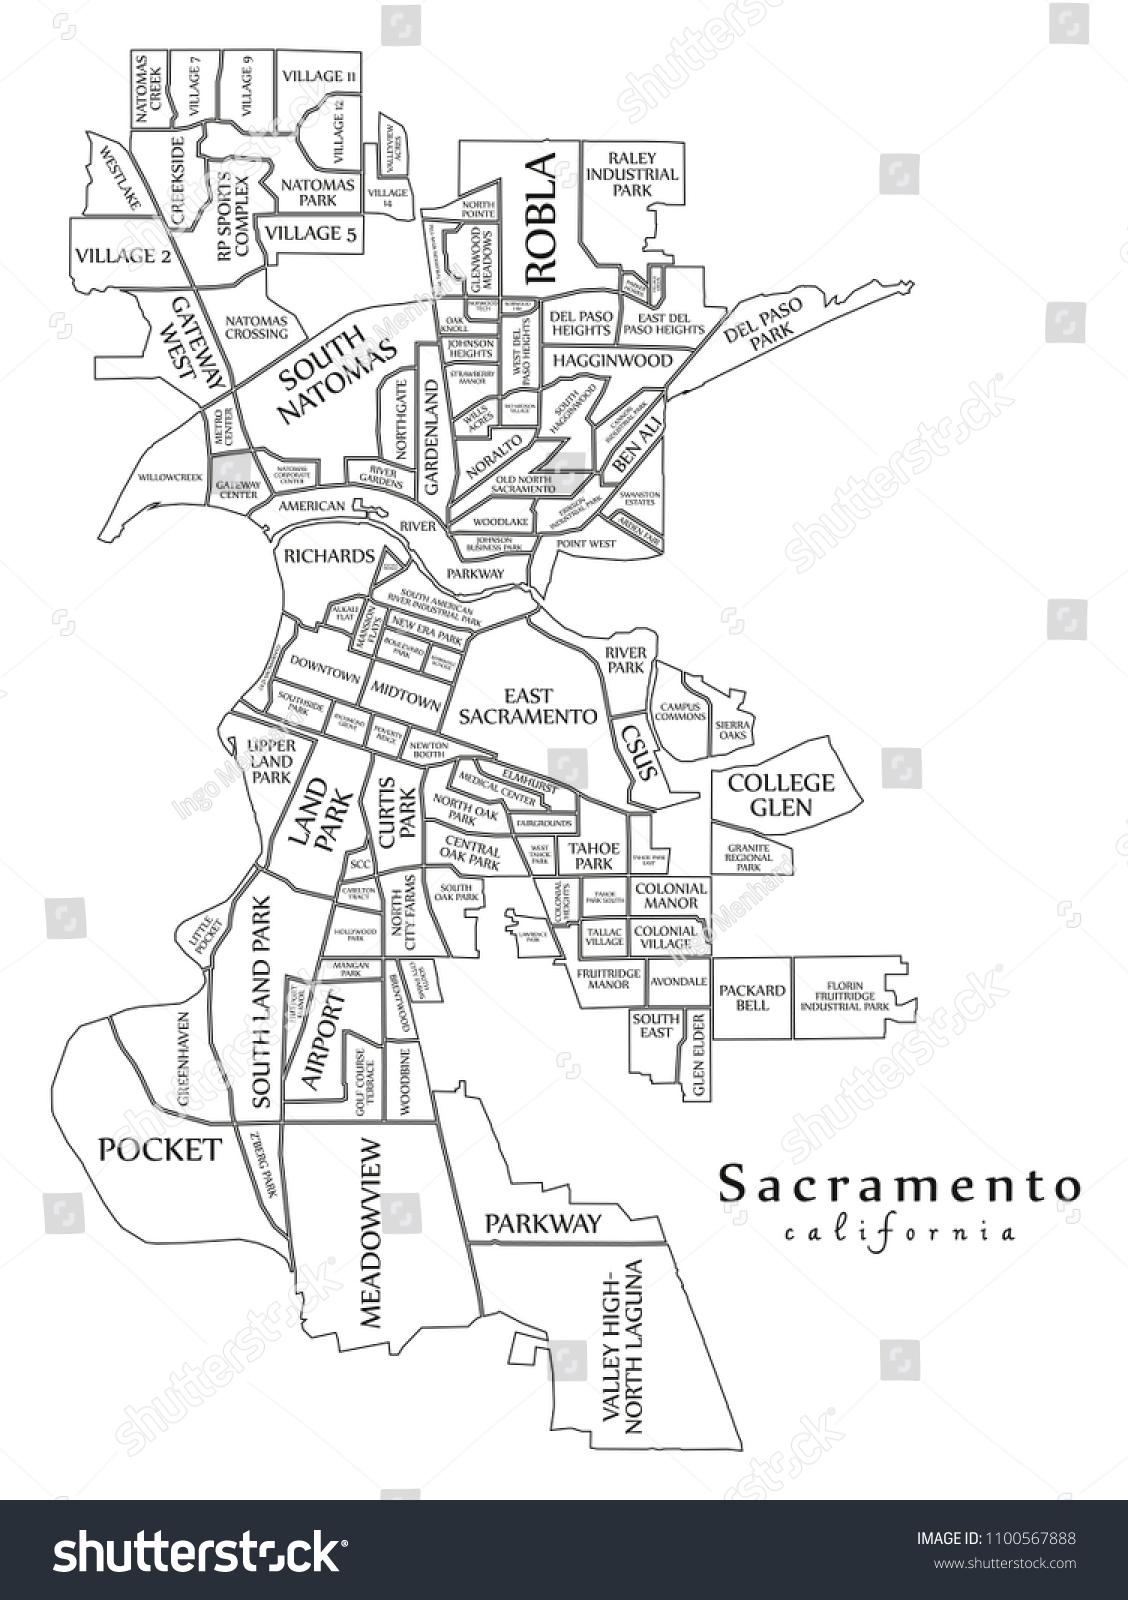 Modern City Map Sacramento California City Stock Vector ... on lancaster map outline, chico map outline, inglewood map outline, fullerton map outline, san francisco map outline, washington and oregon map outline, usa map outline, inyo county map outline, avalon map outline,